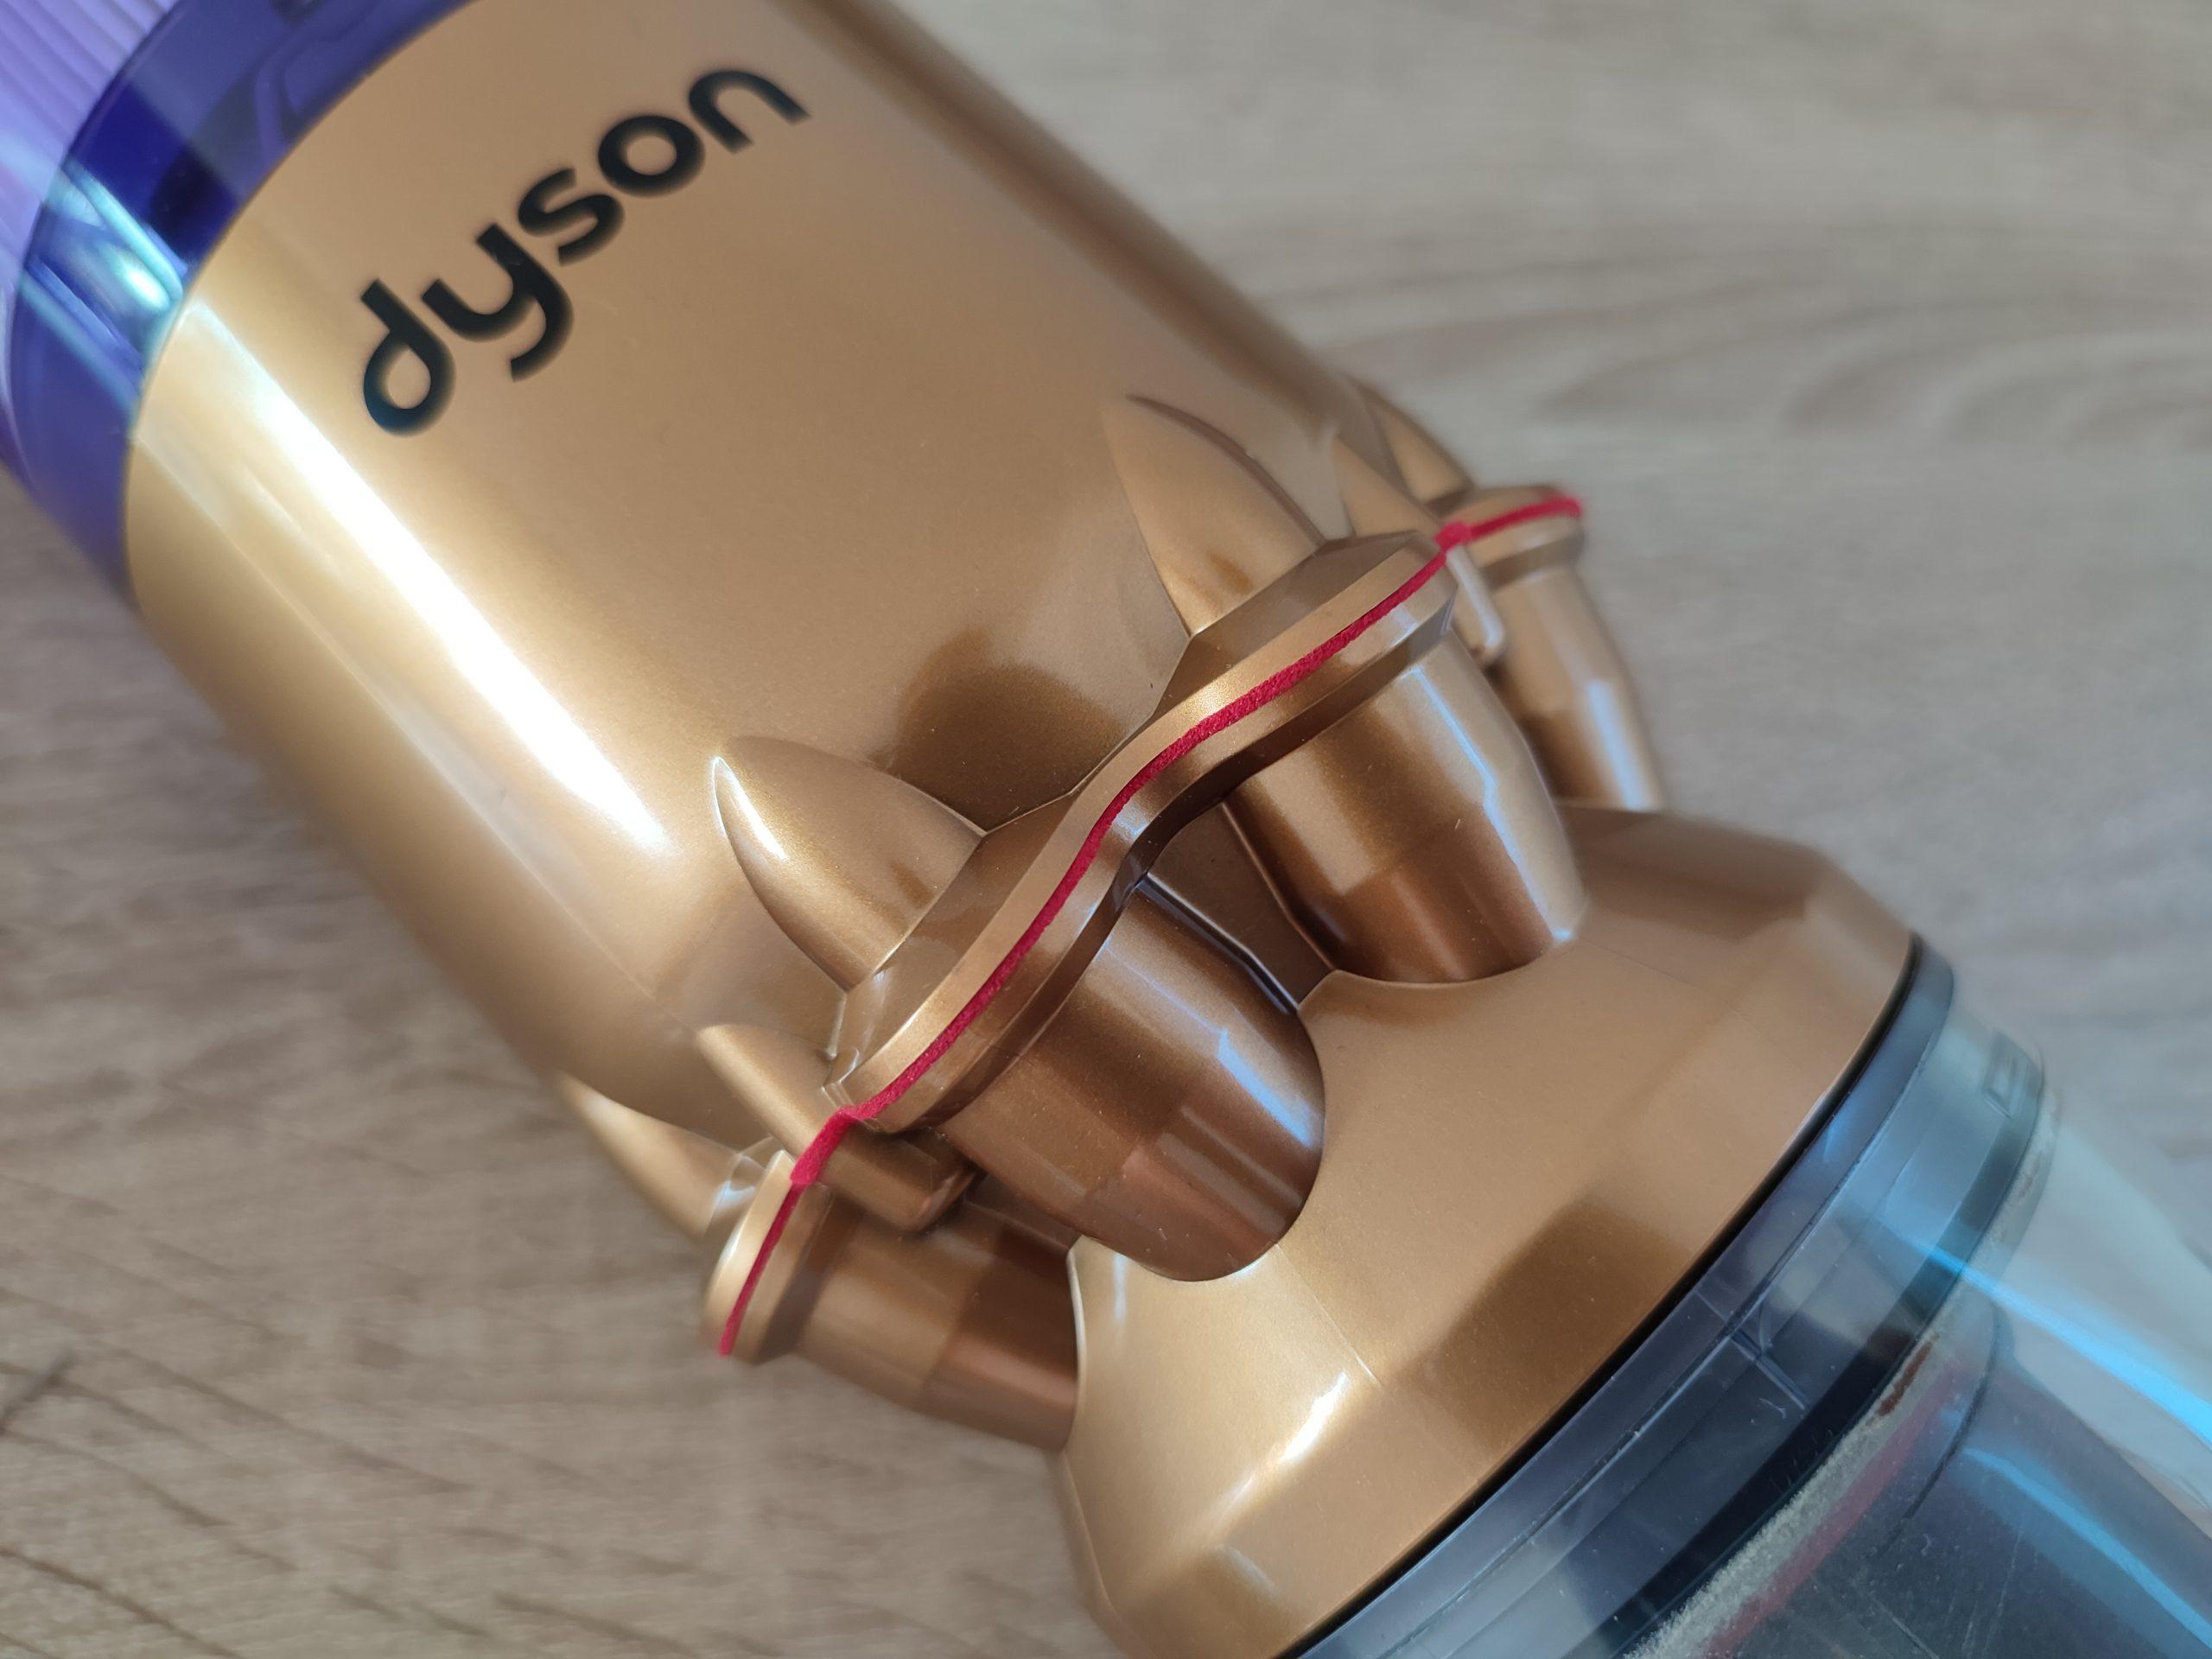 Dyson Omni-Glide Akkusauger Design Hauptelement